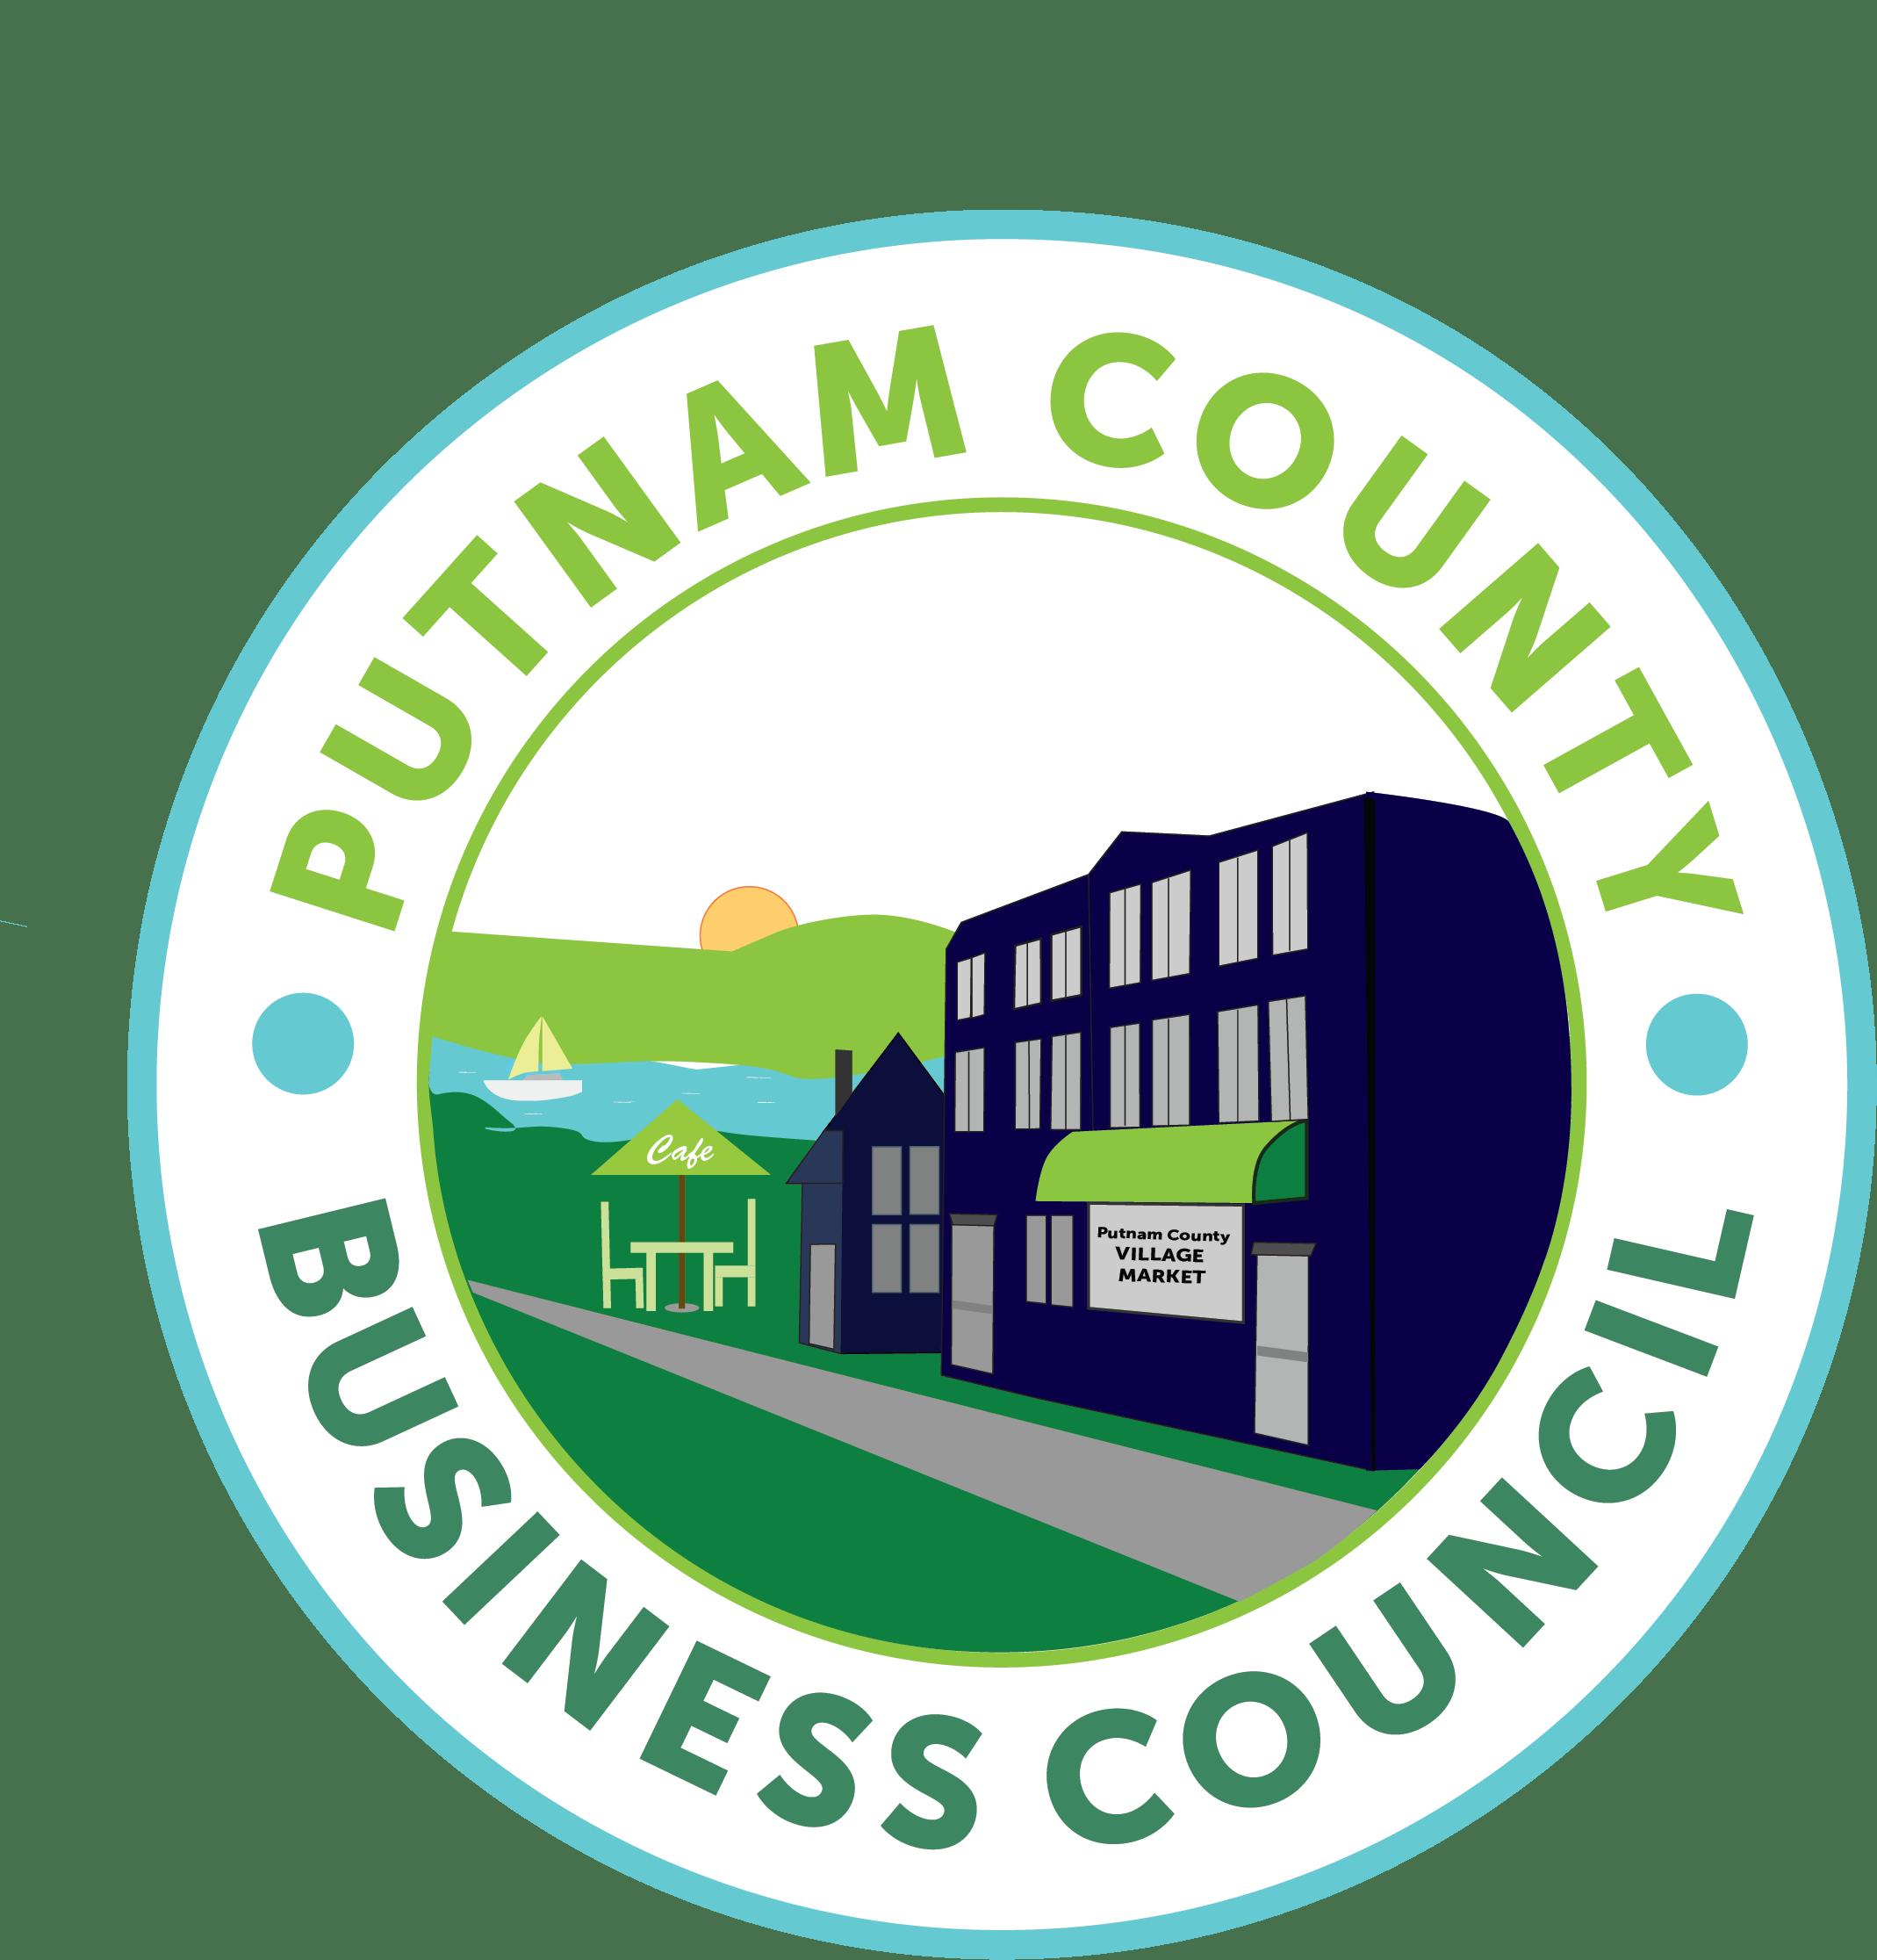 Putnam County Business Council